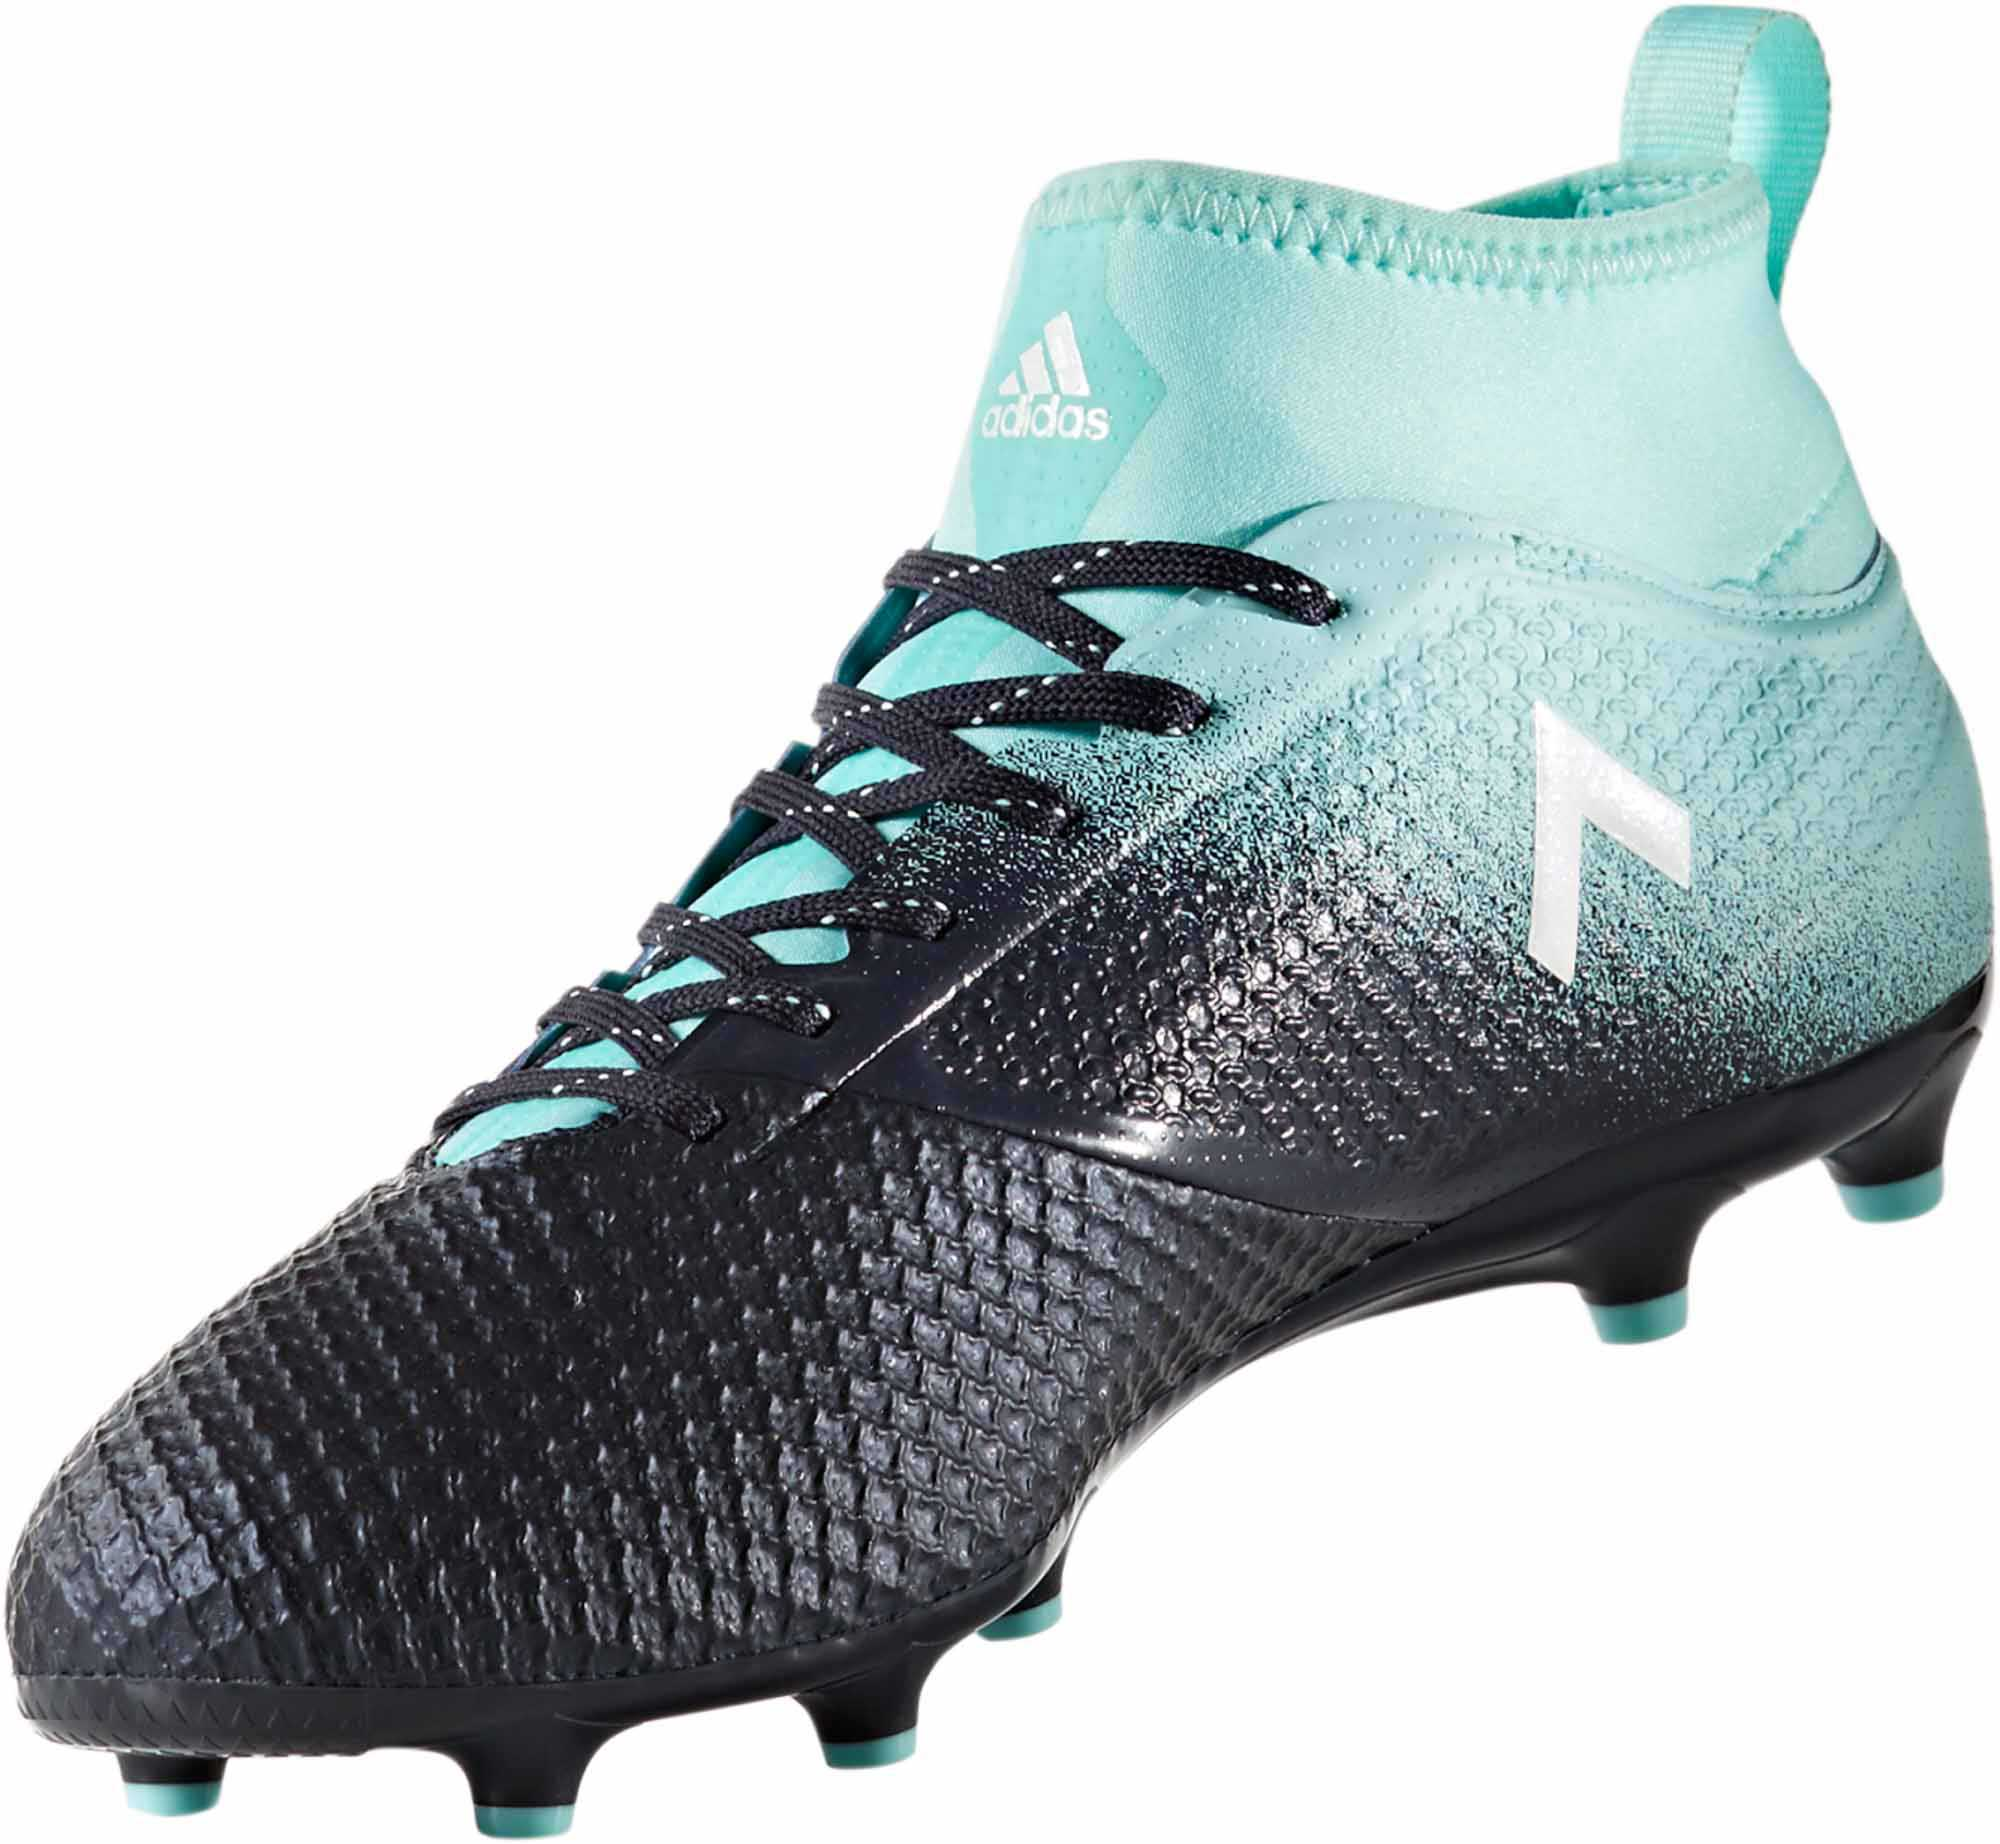 adidas ACE 17.3 FG - Blue adidas Soccer